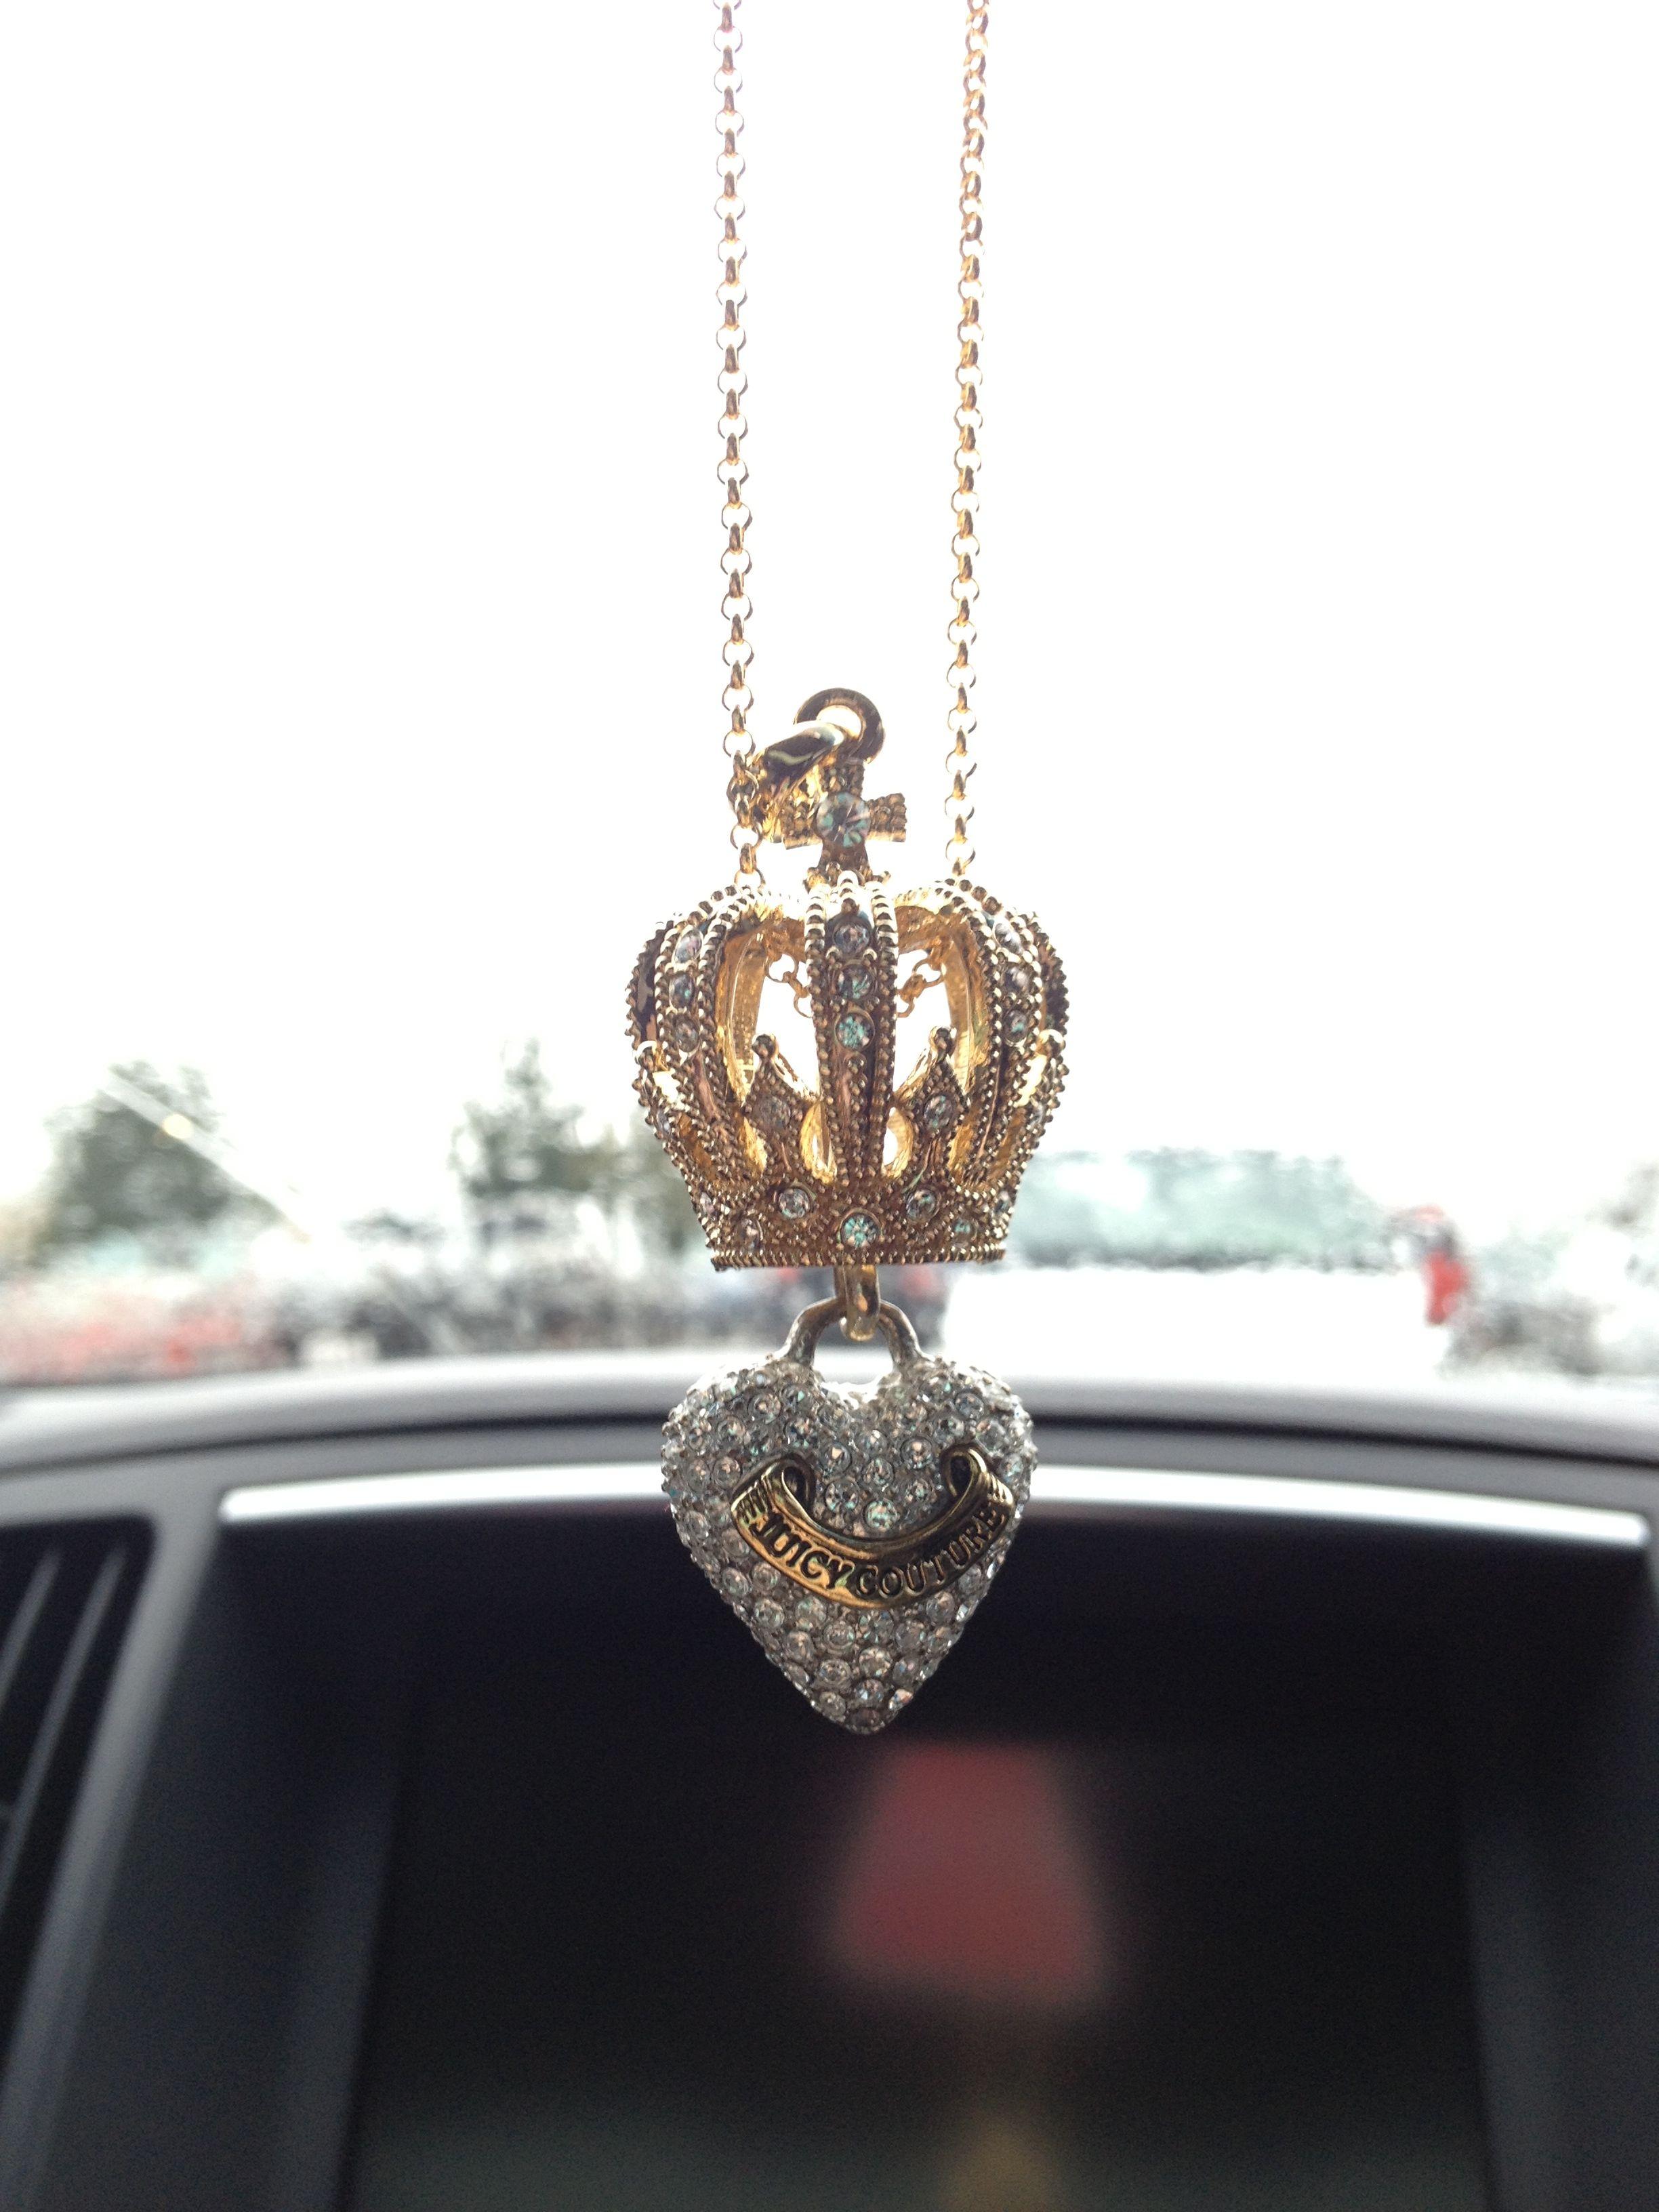 Hang Rear View Mirror